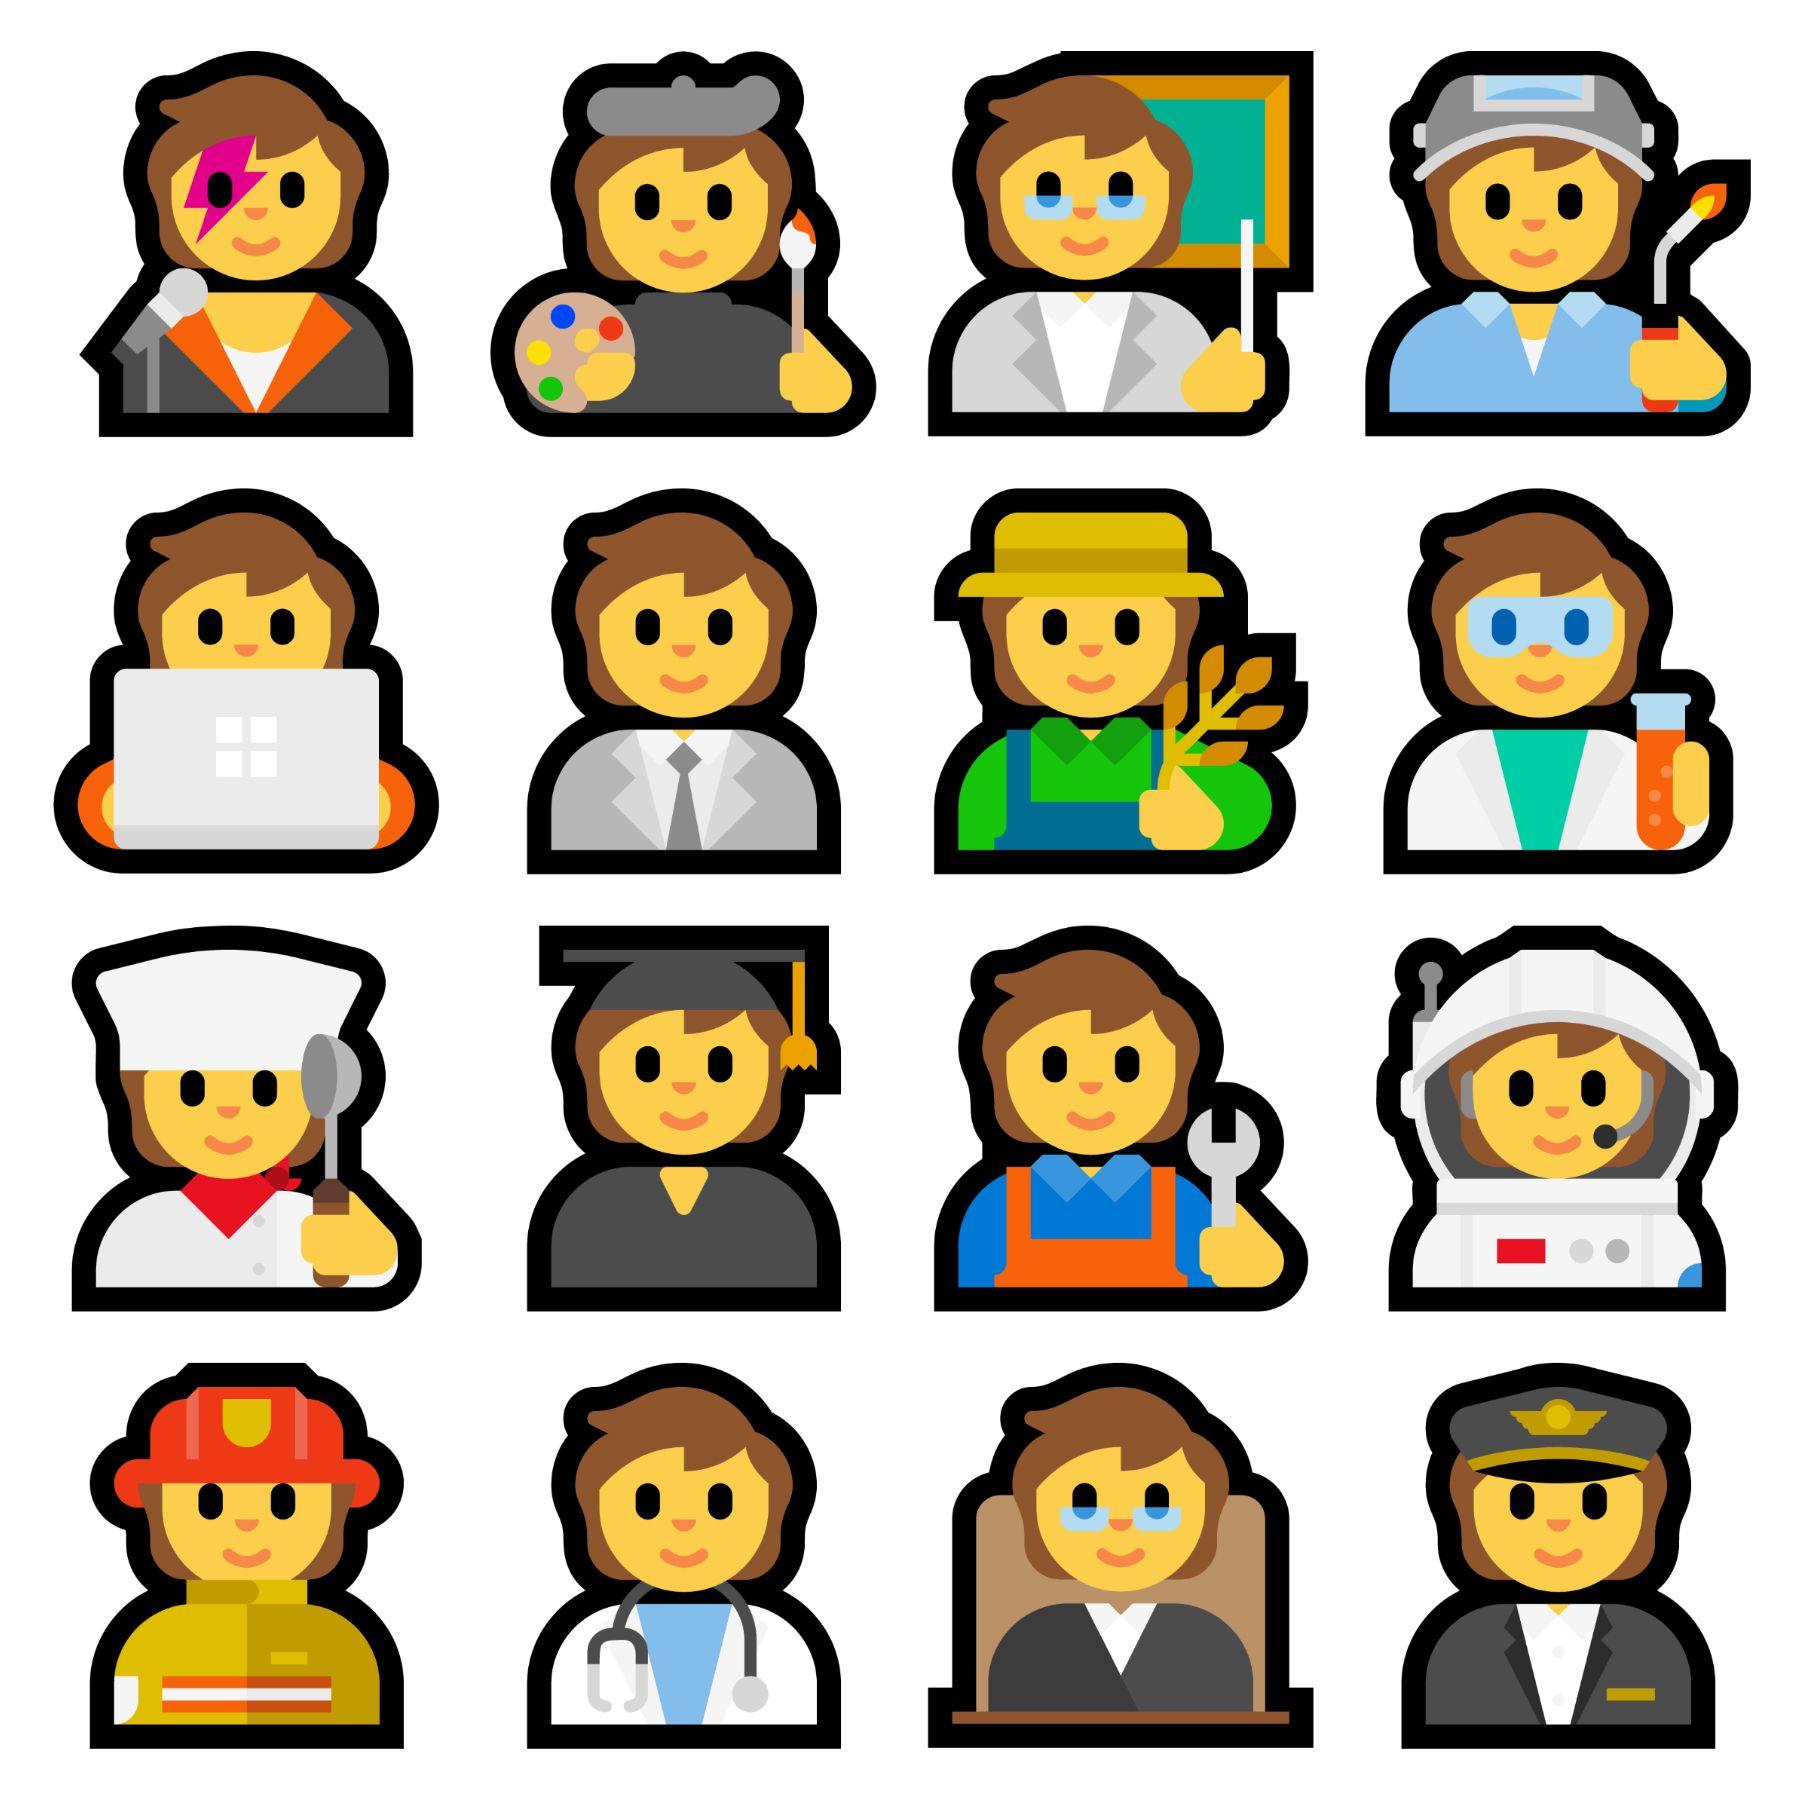 Emojipedia-Windows-11-New-Profession-Emojis